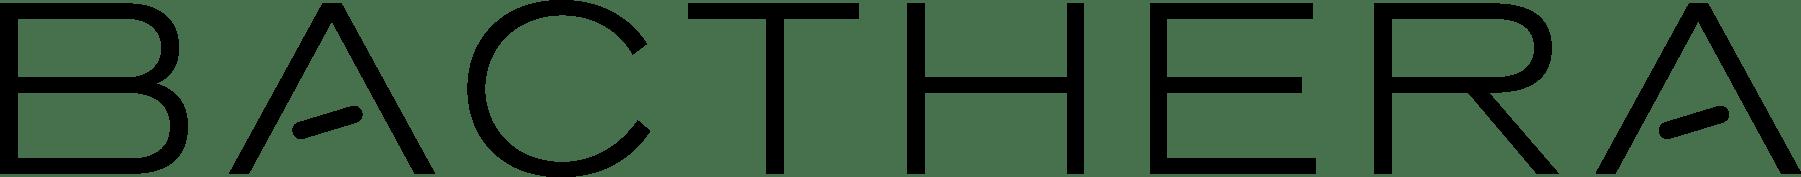 BACTHERA_logo_RGB_black-002